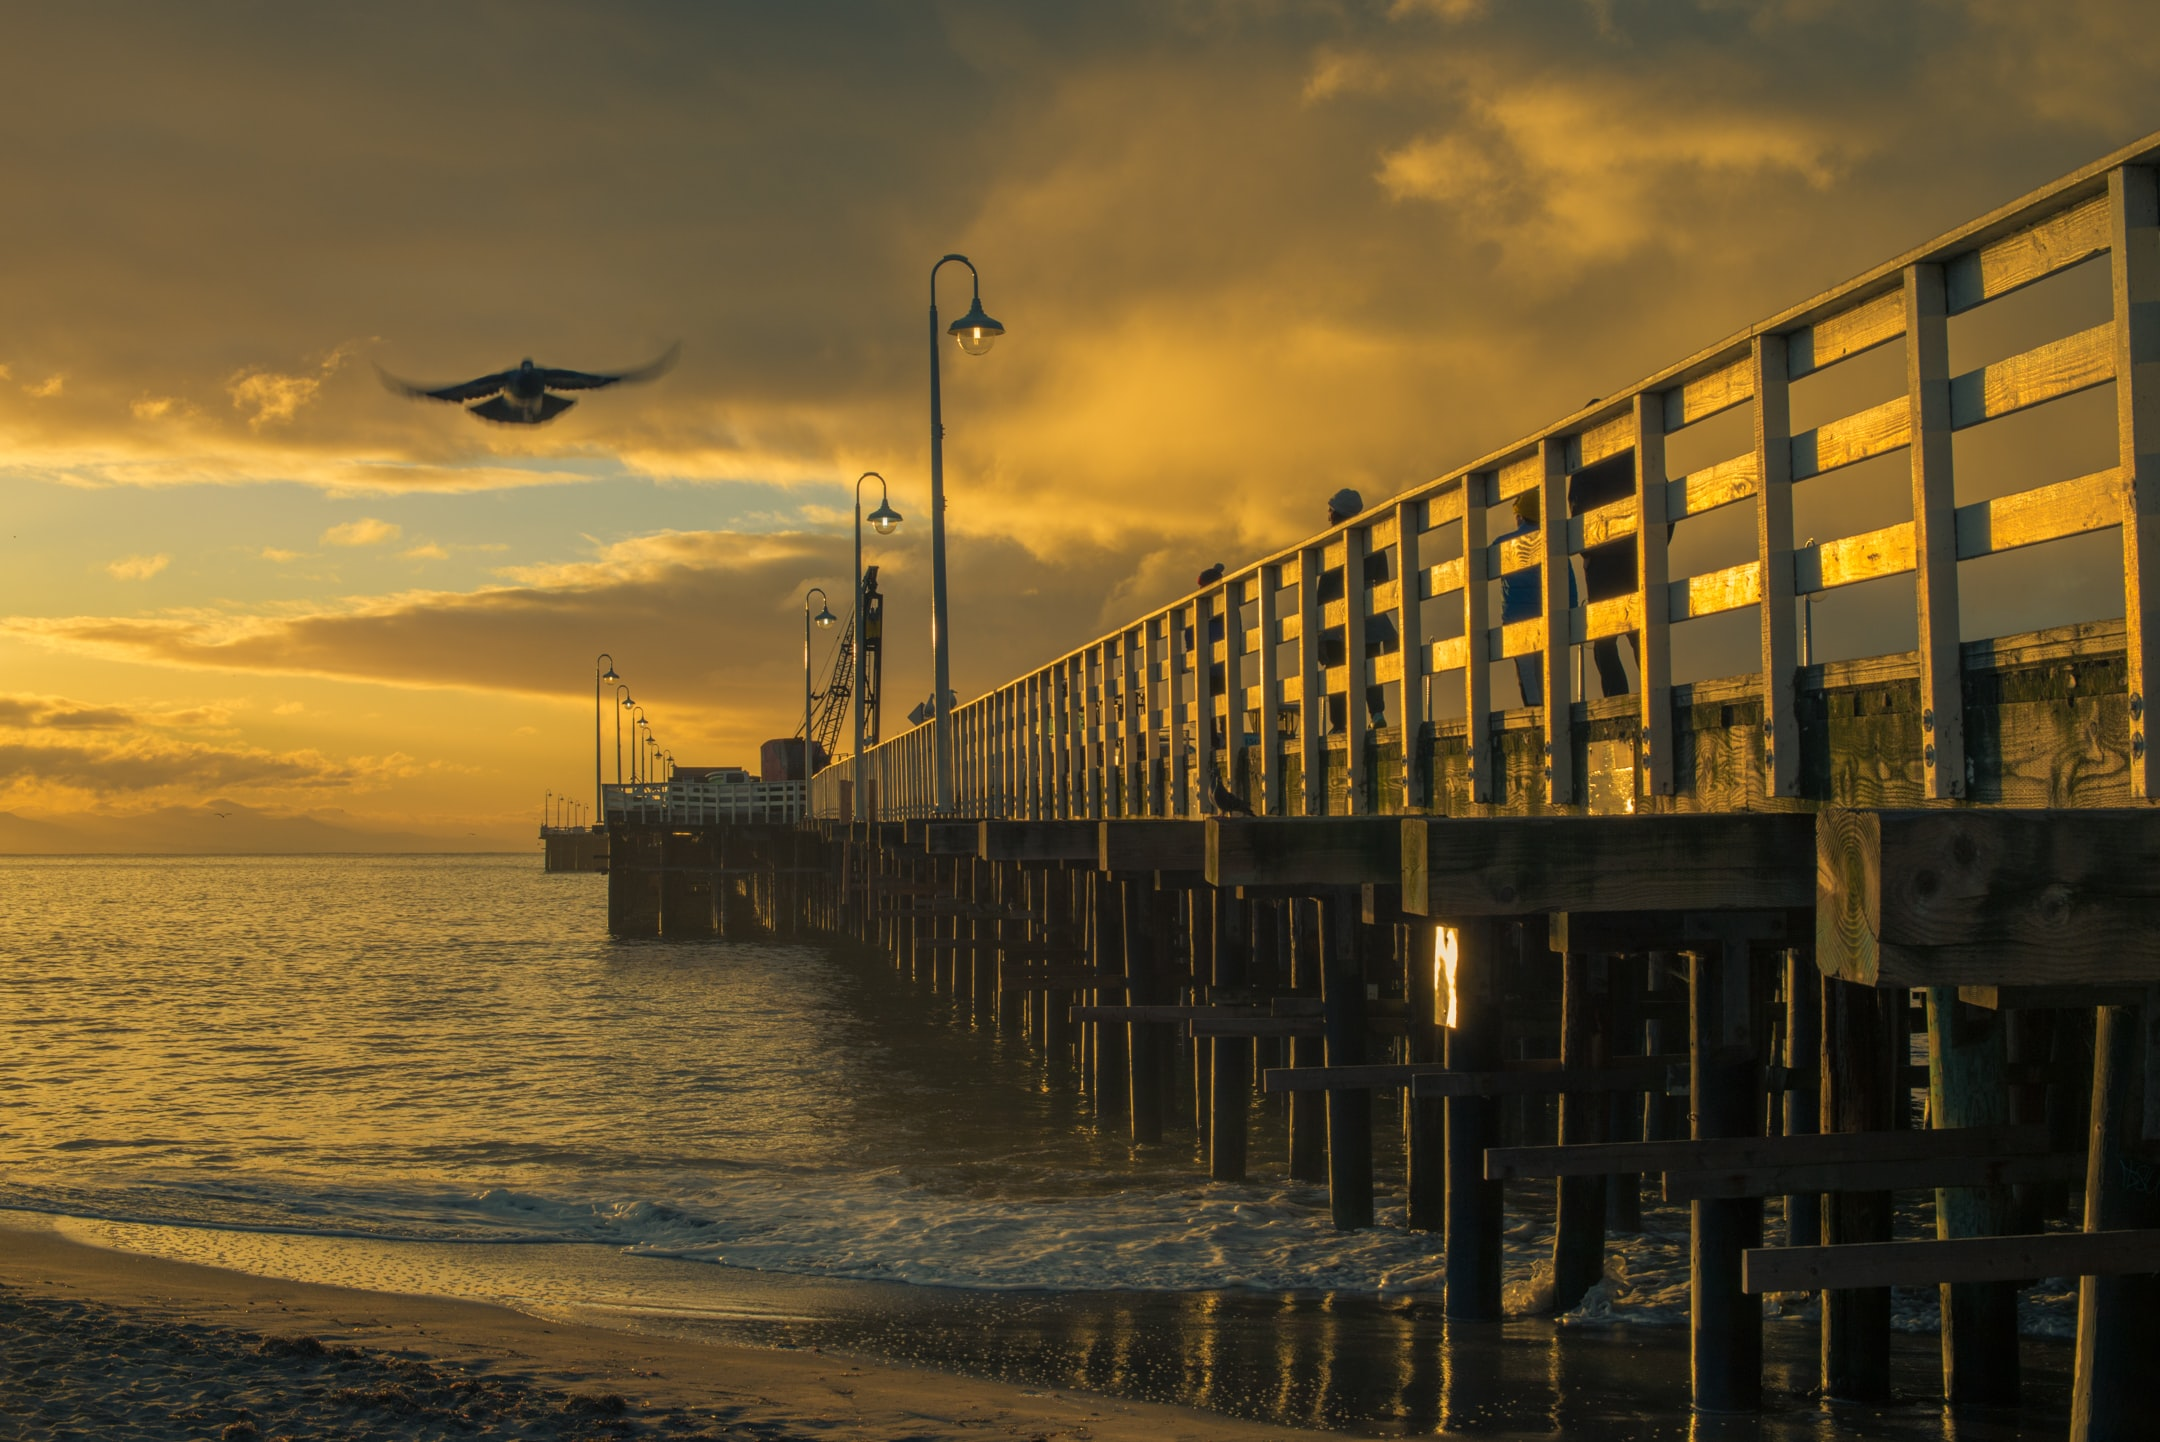 beach dock under golden hour